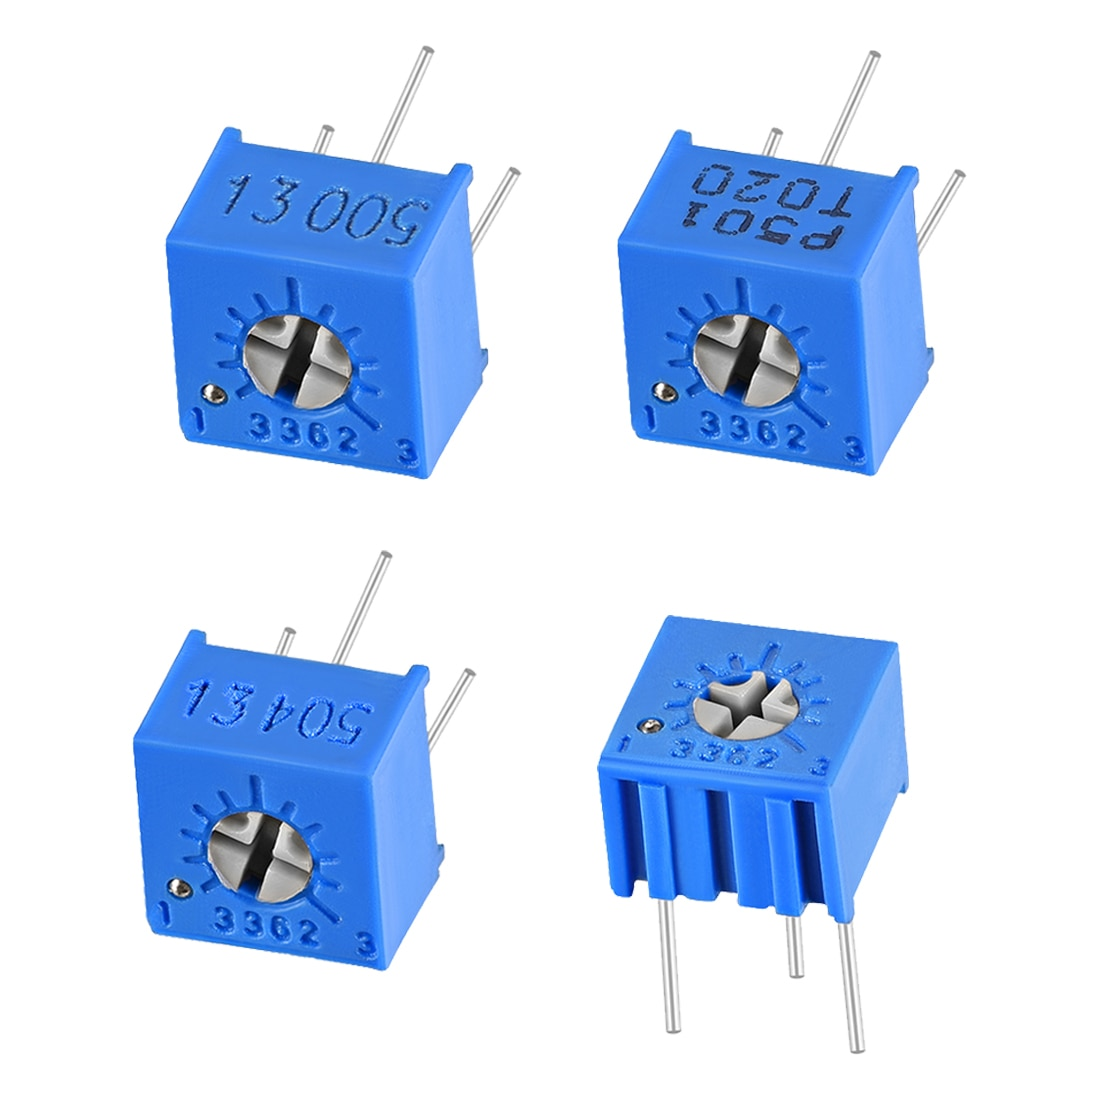 Potenciómetro uxcell 9 para Audio estéreo interruptor de volumen Control PCB o DIY como divisor de voltaje controlador de corriente Reóstato